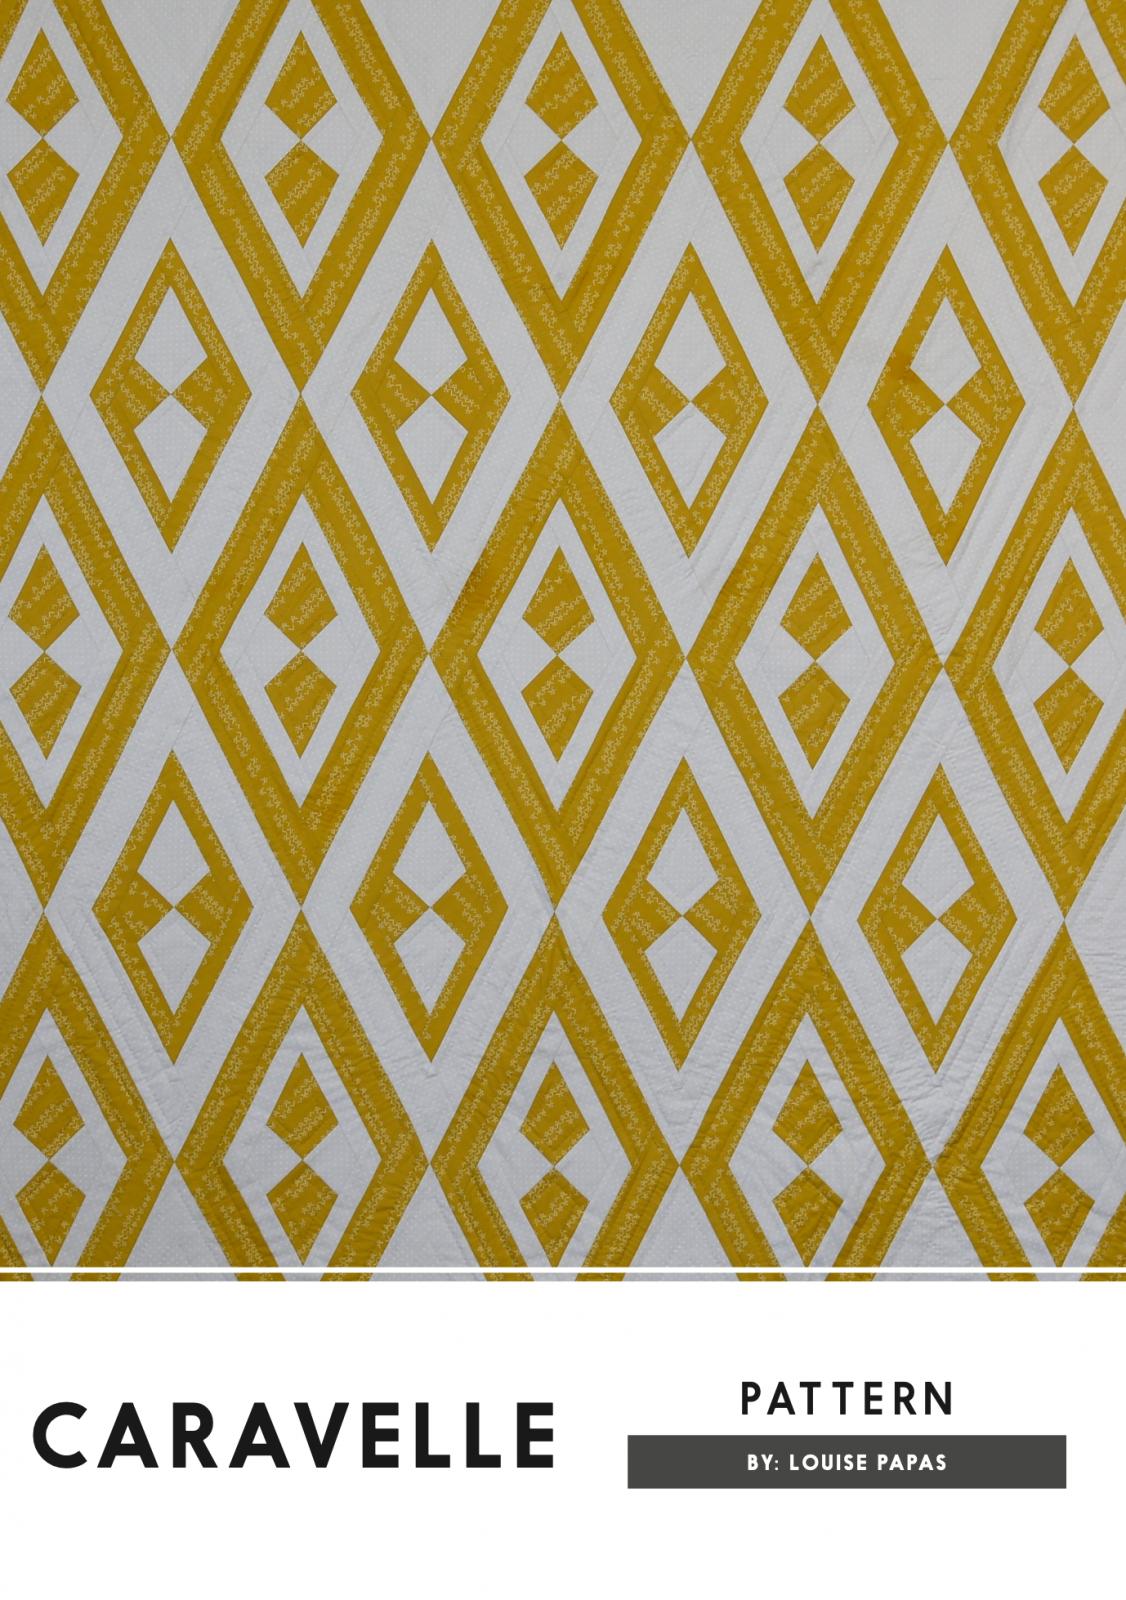 Caravelle Pattern by Louise Papas